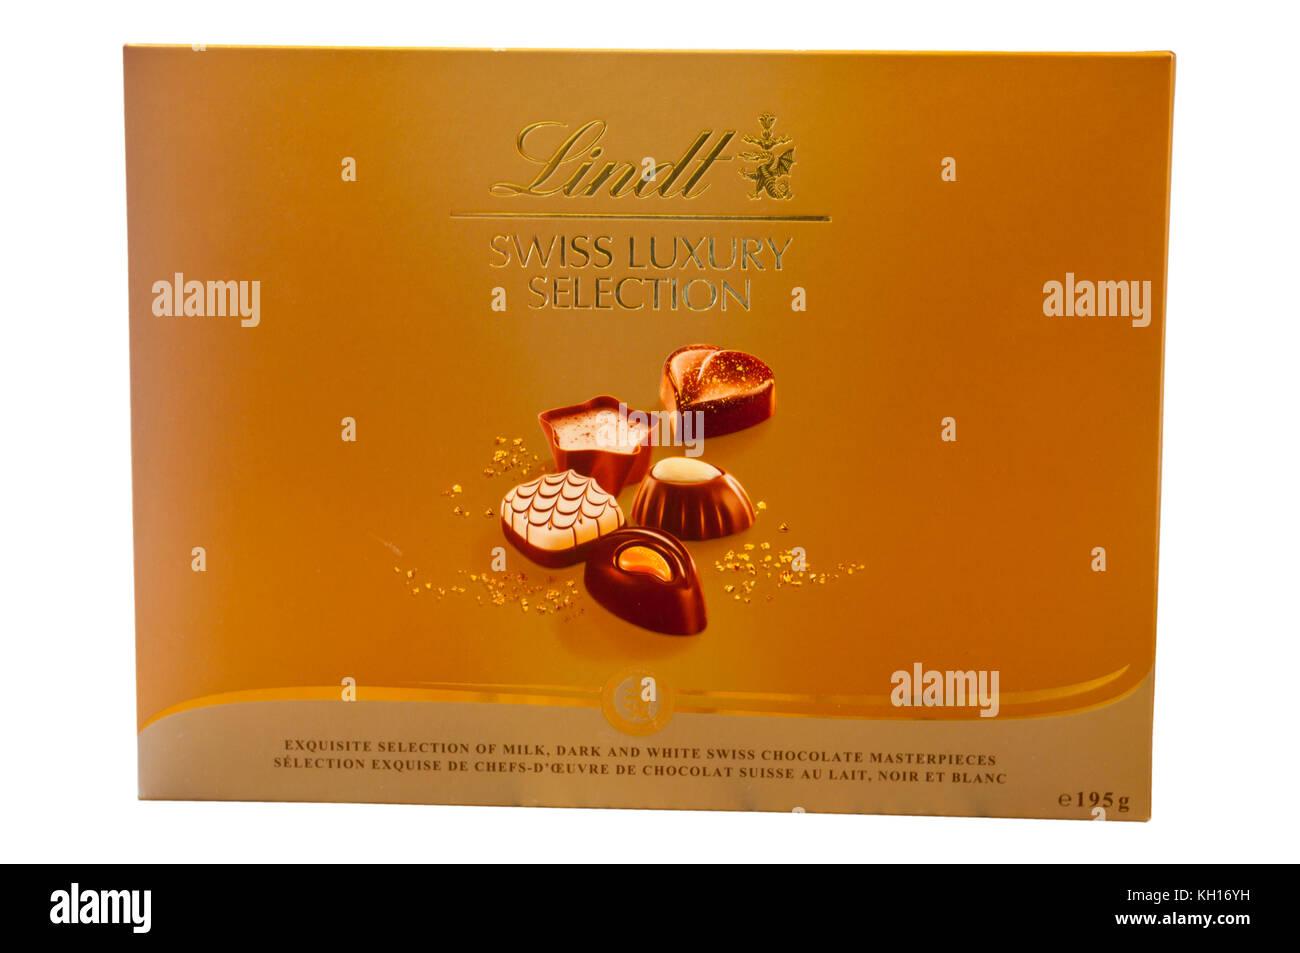 UNopened Box Of Lindt Swiss Luxury Selection Chocolates - Stock Image